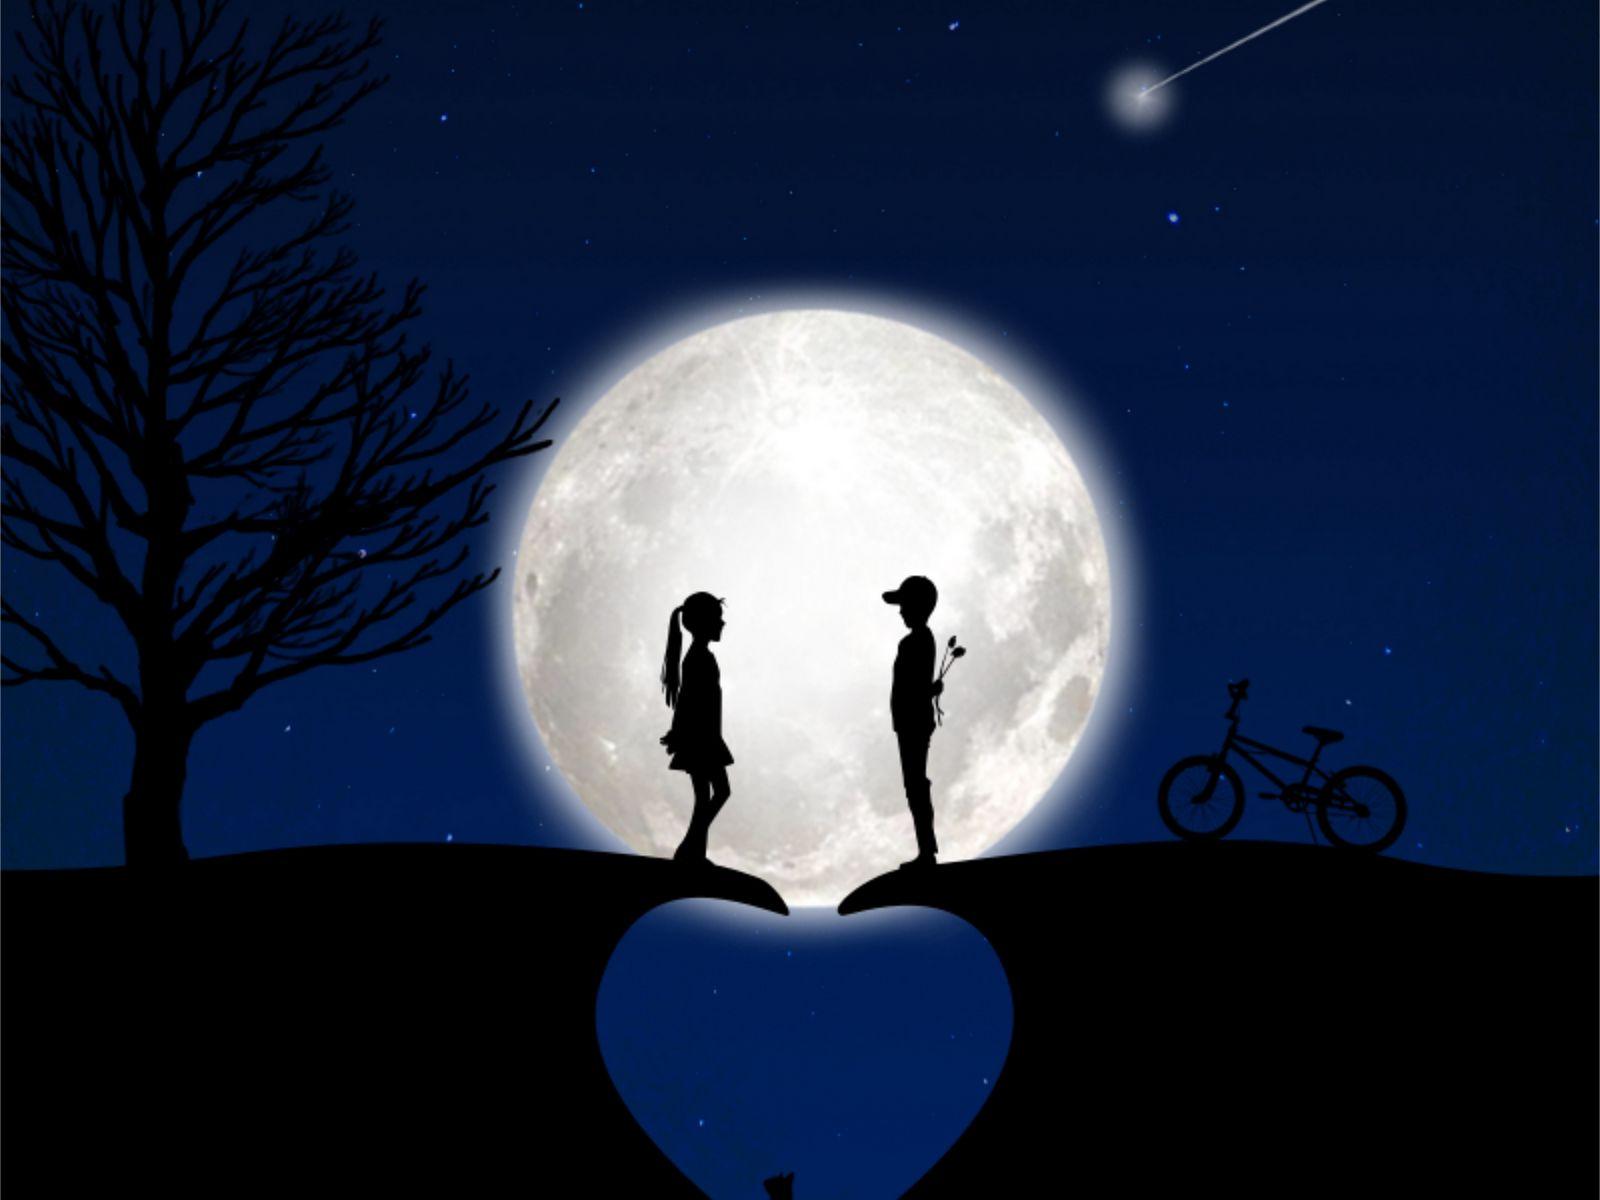 1600x1200 Wallpaper children, silhouettes, love, moon, romance